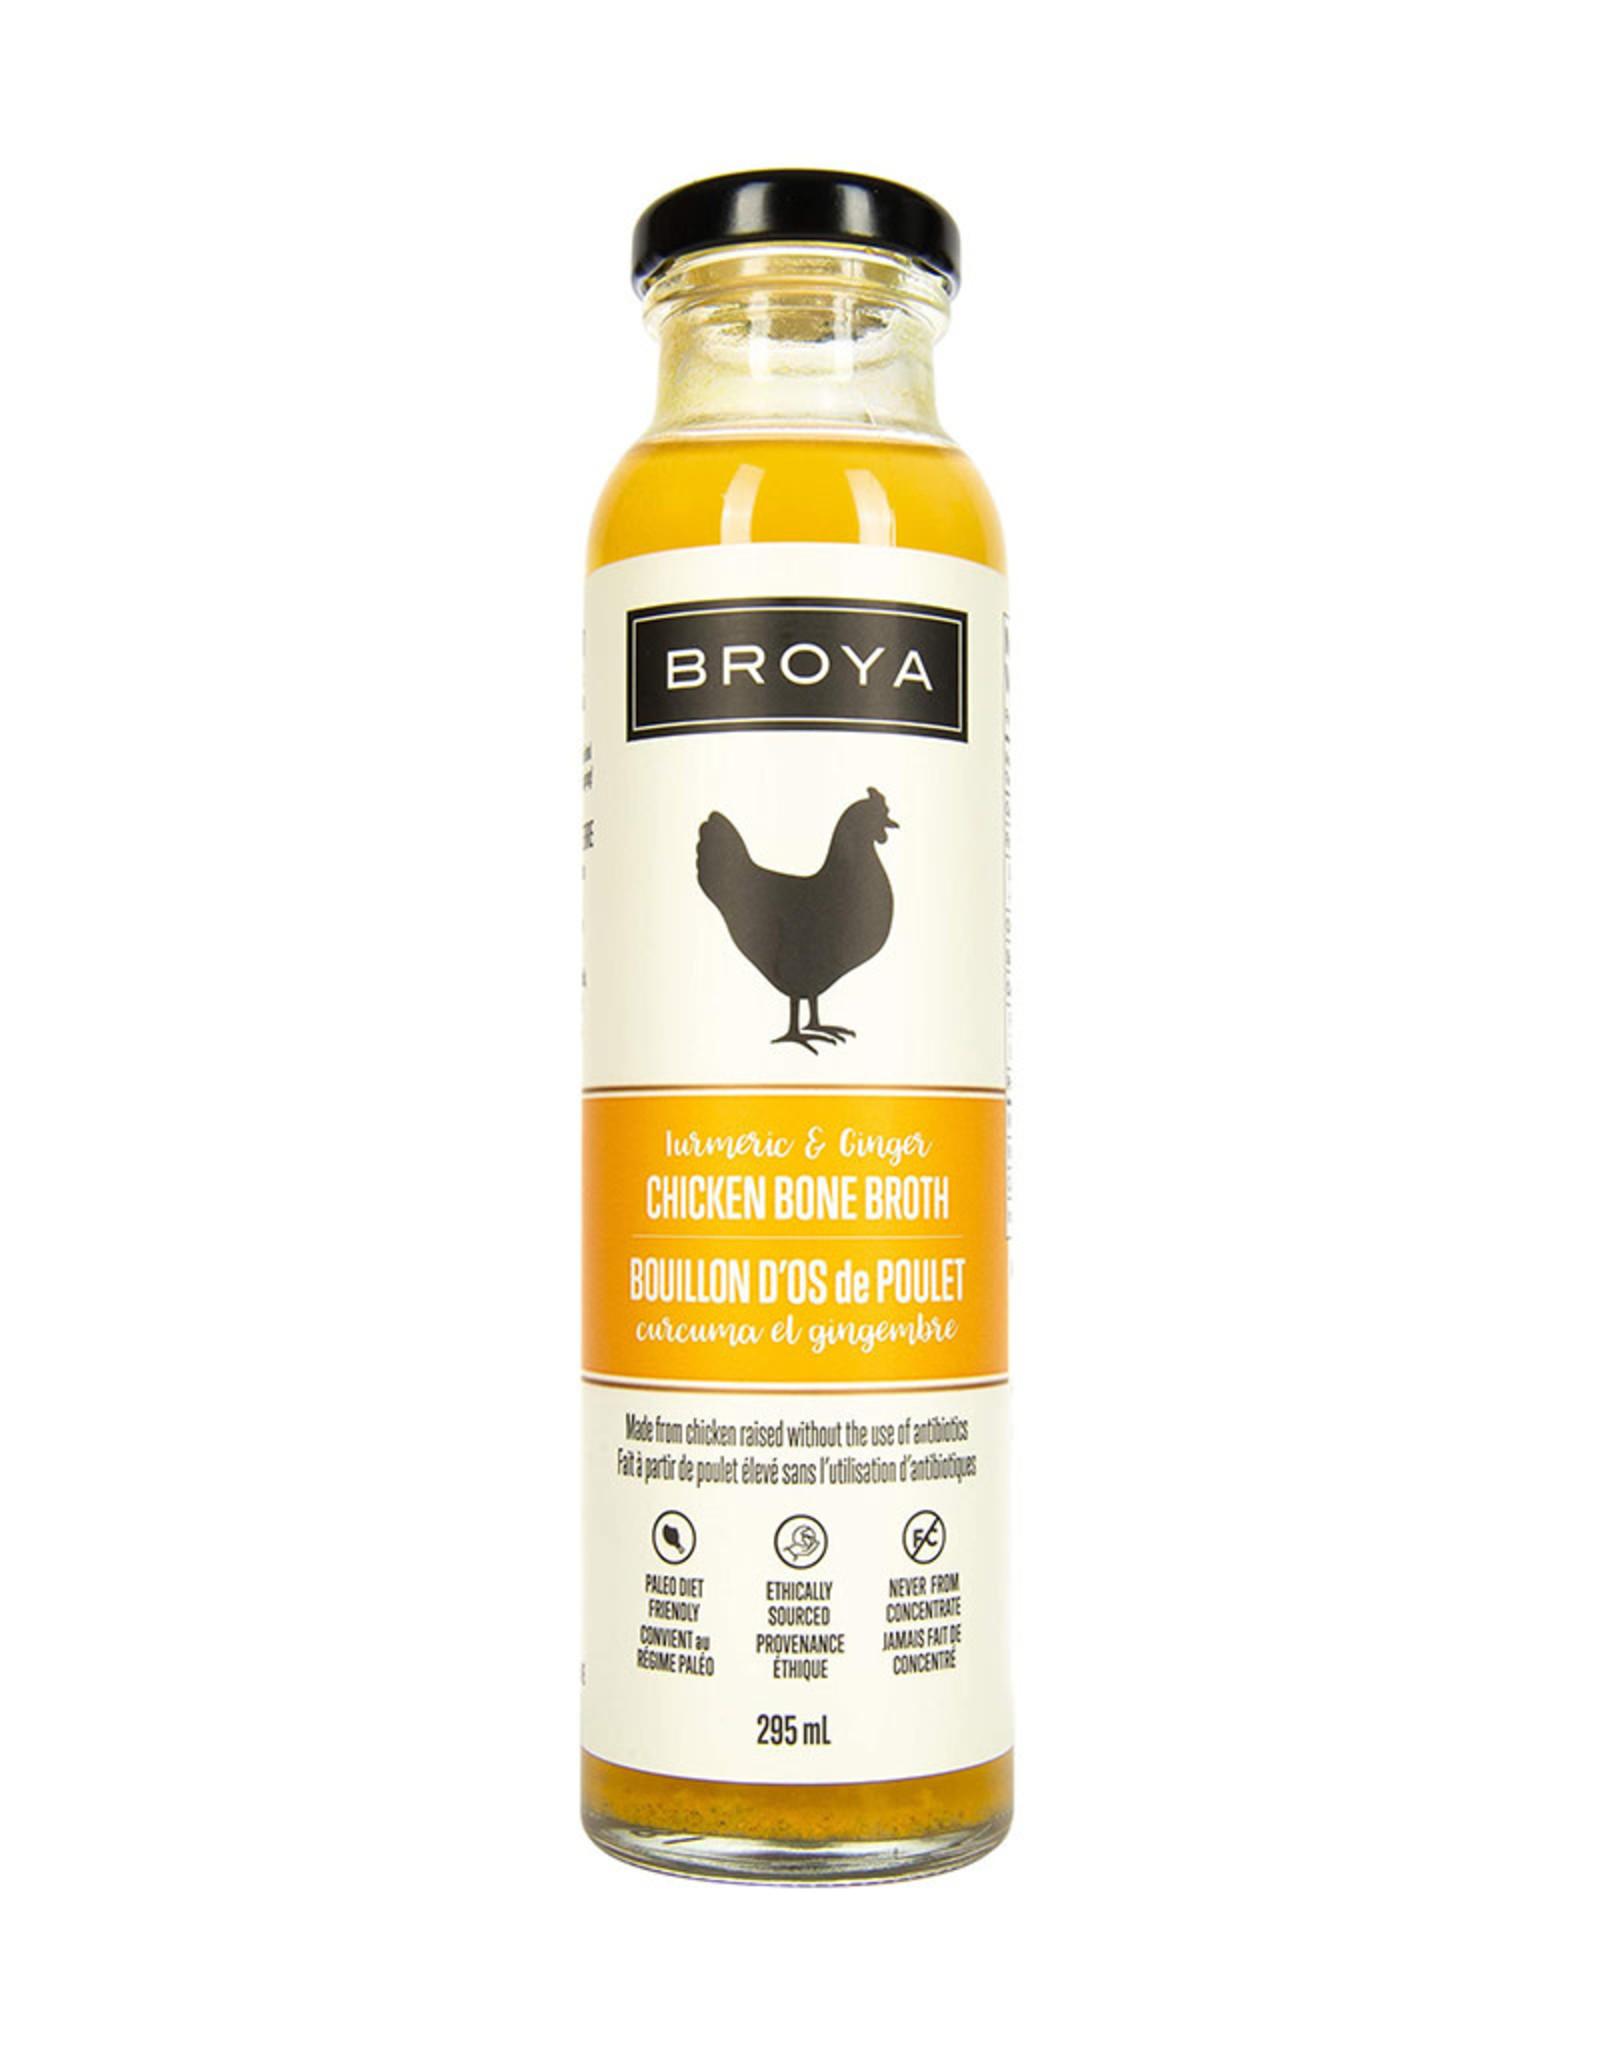 Broya Broya - Chicken Bone Broth, Turmeric & Ginger